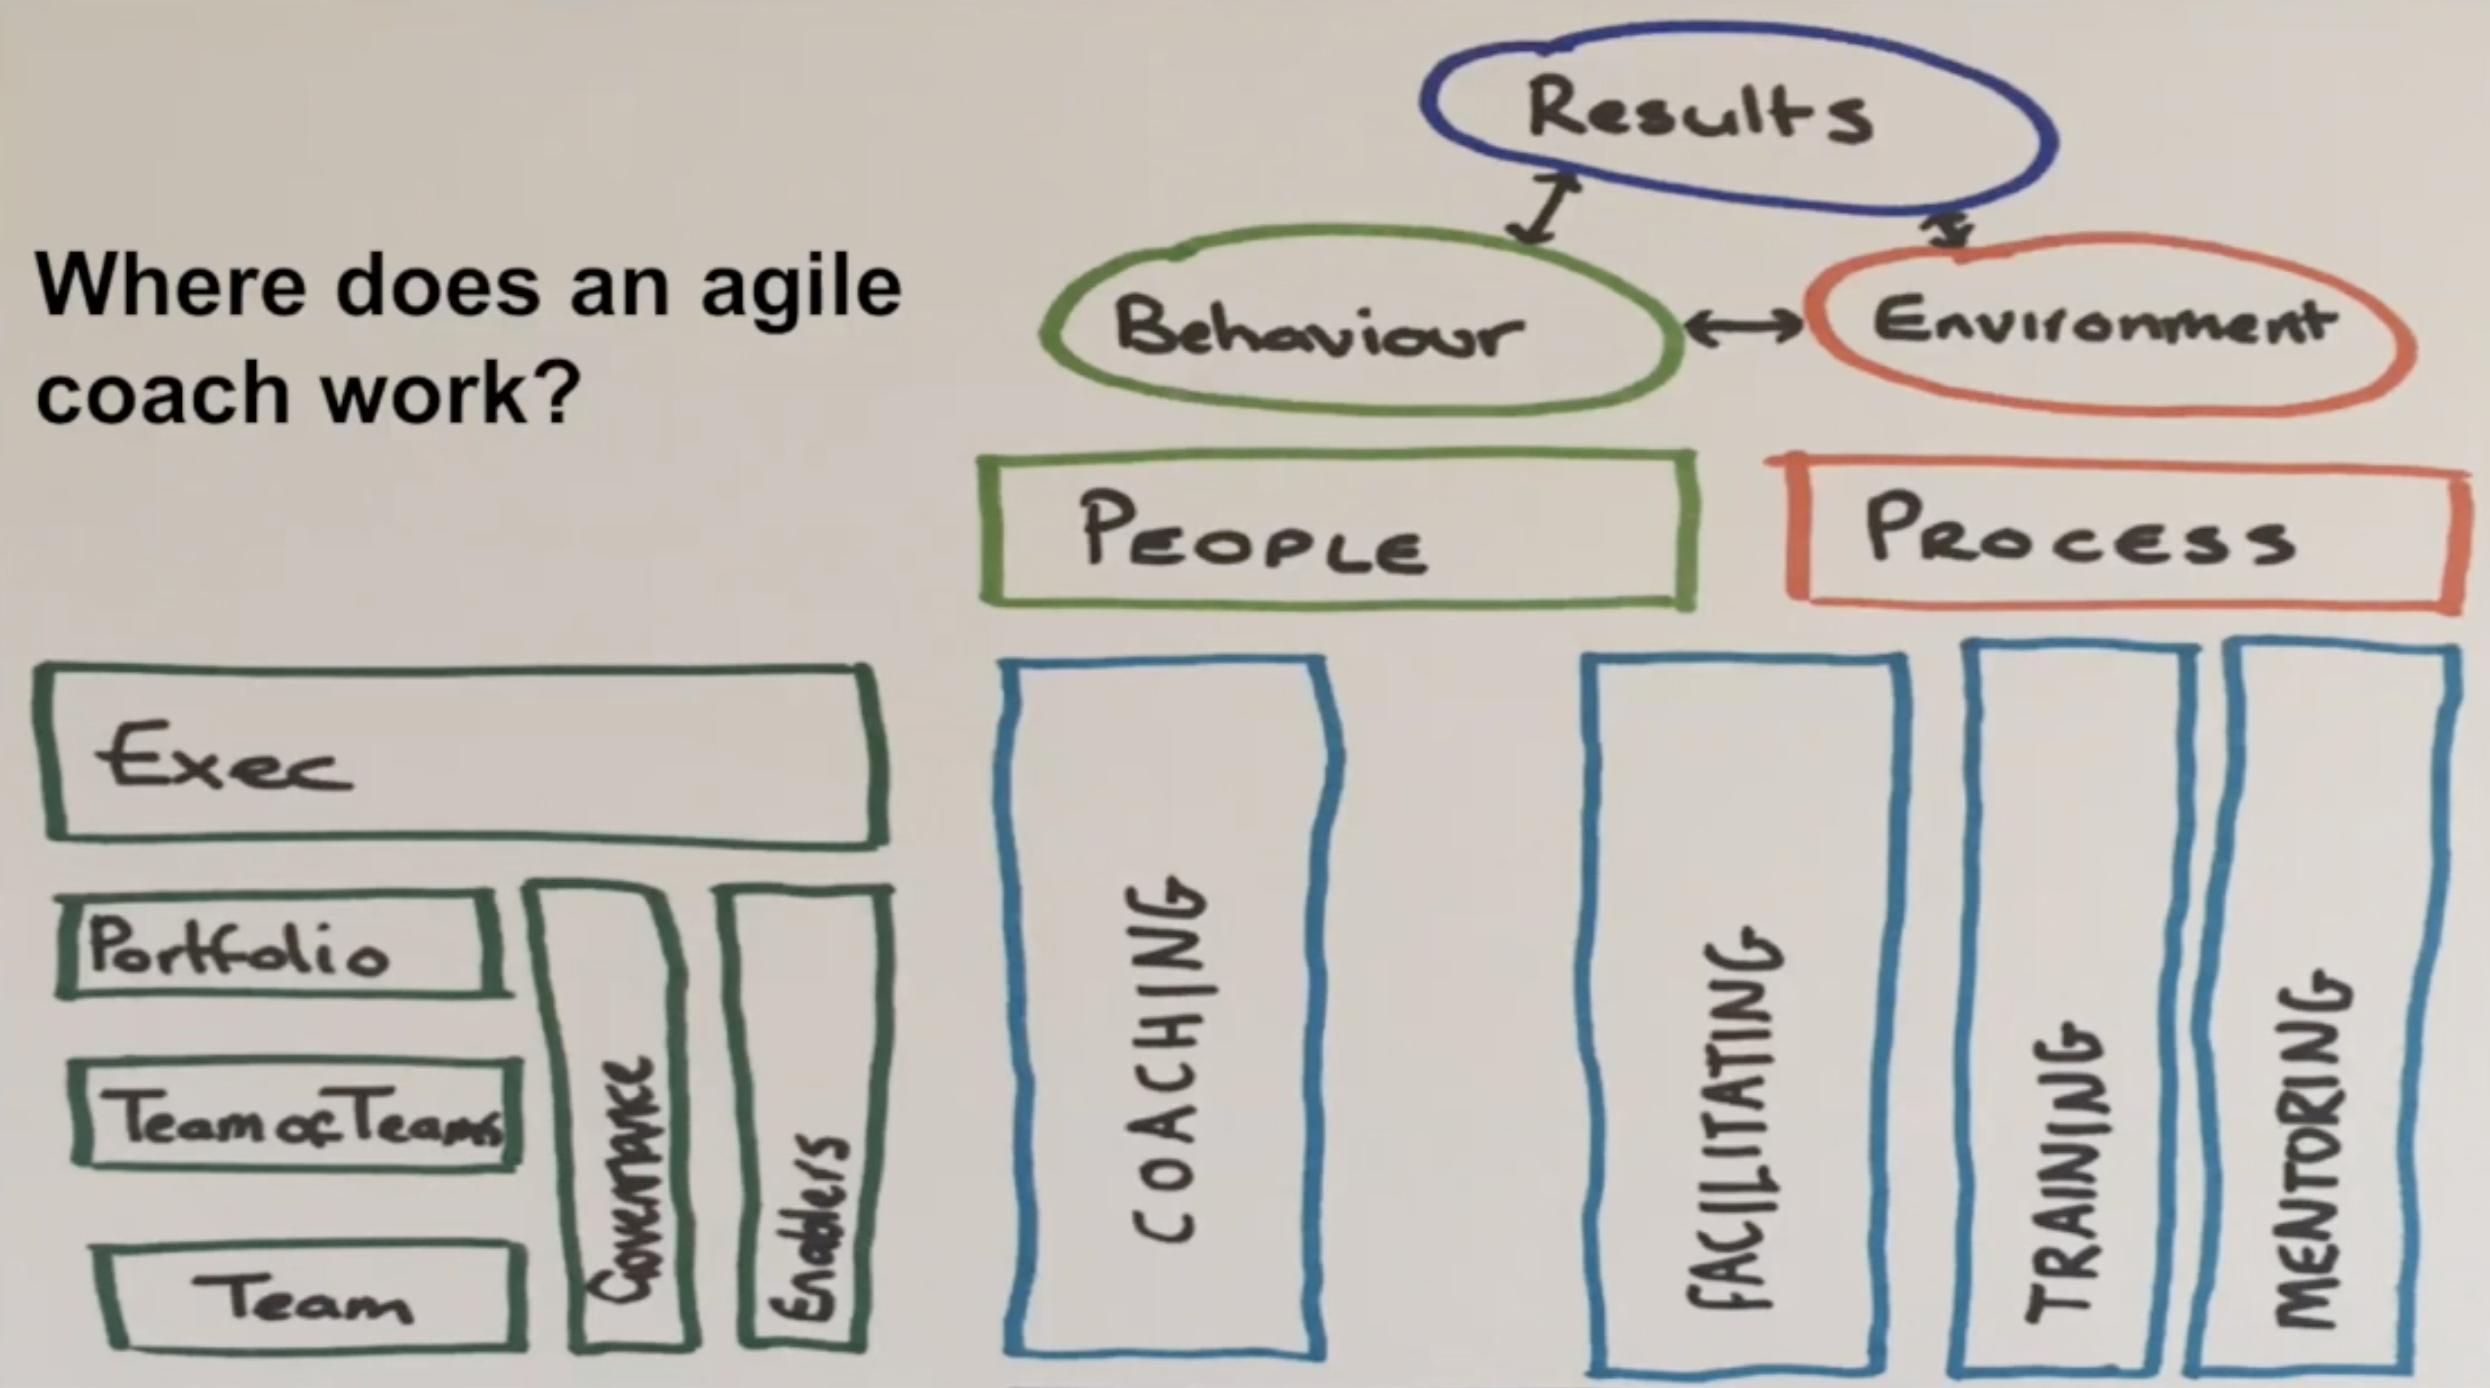 Where does the Agile Coach work?